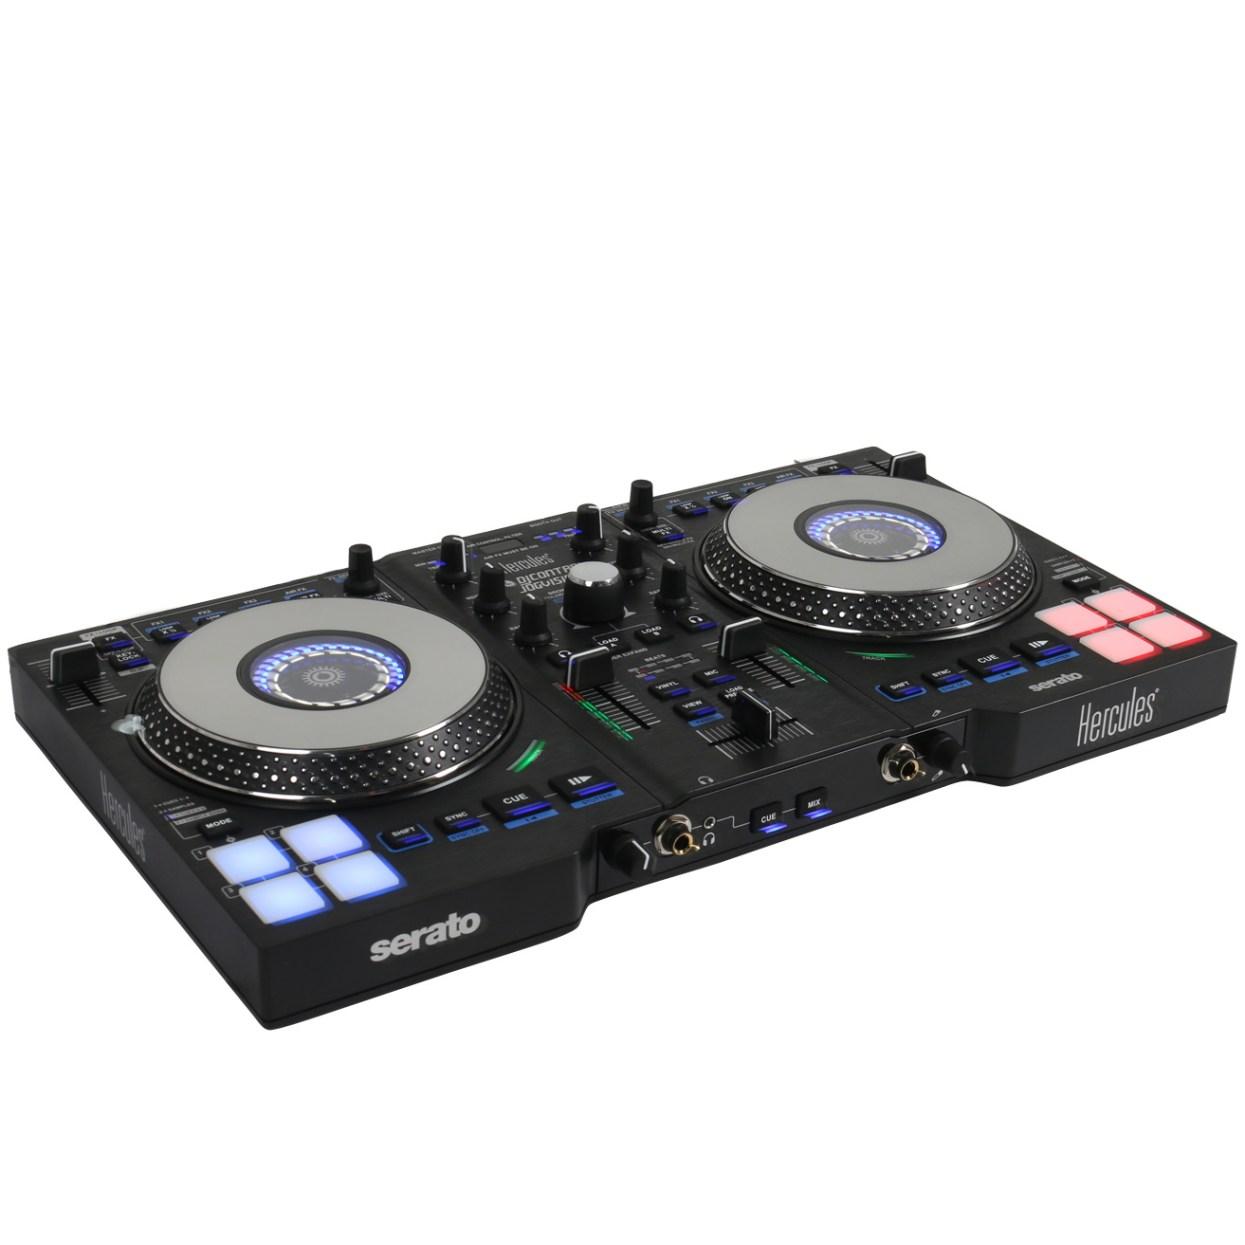 Hercules DJ Control Jogvision DJ-controller